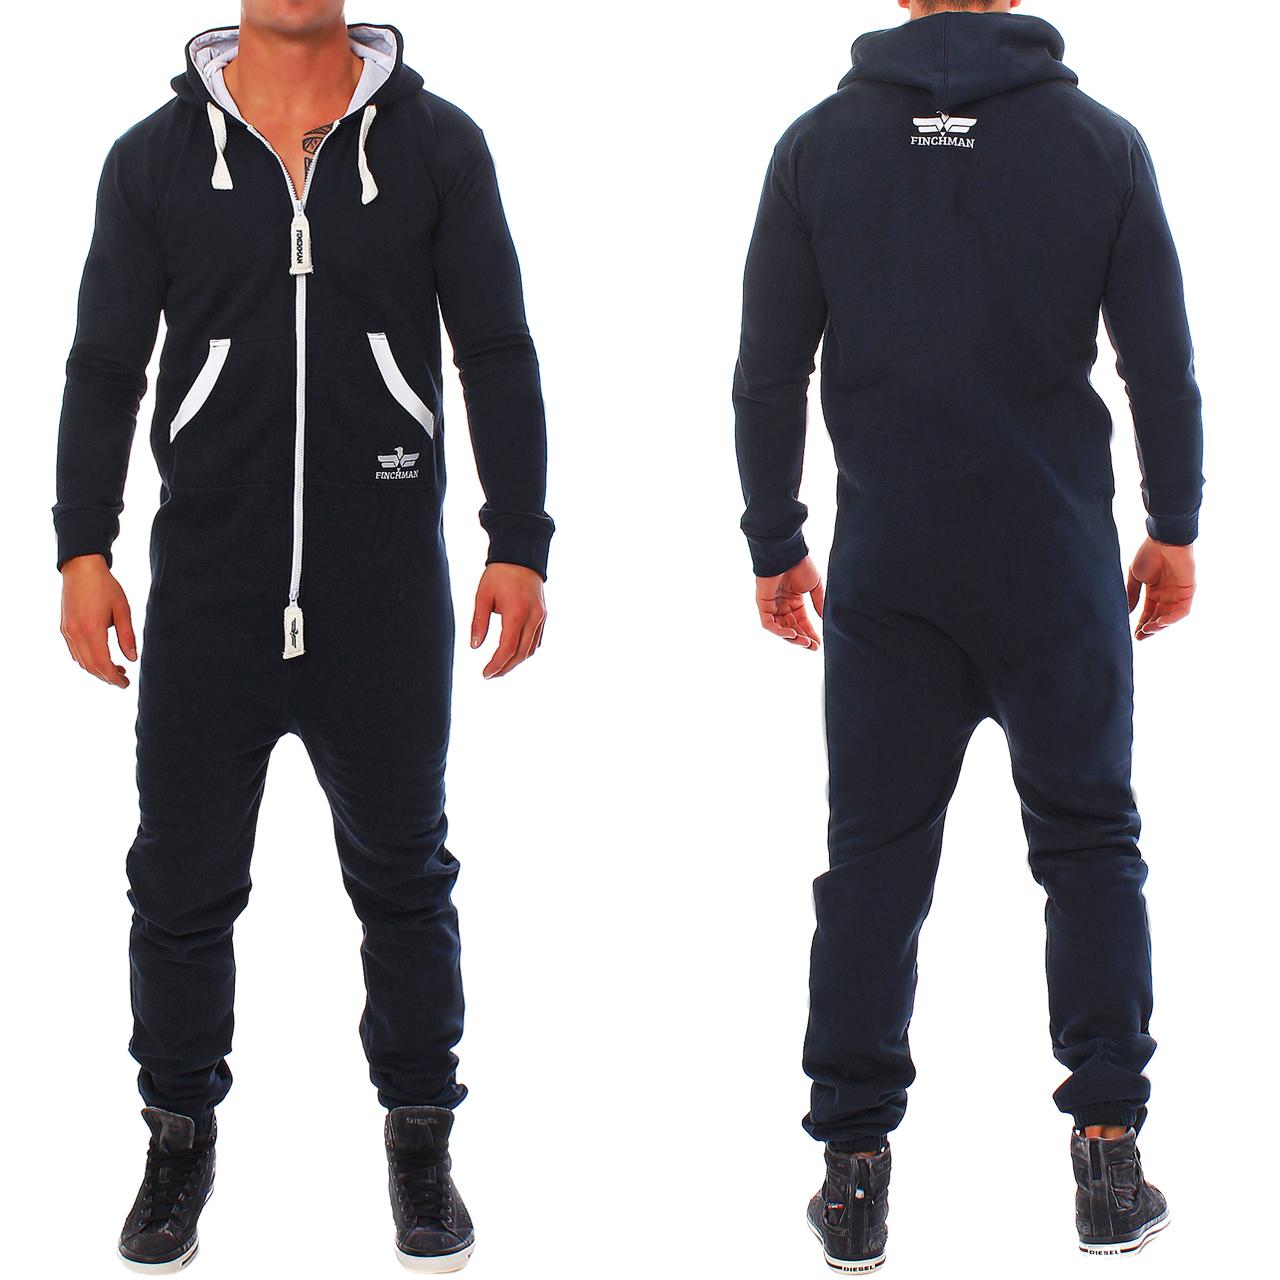 finchman herren jumpsuit jogger jogging anzug trainingsanzug overall. Black Bedroom Furniture Sets. Home Design Ideas